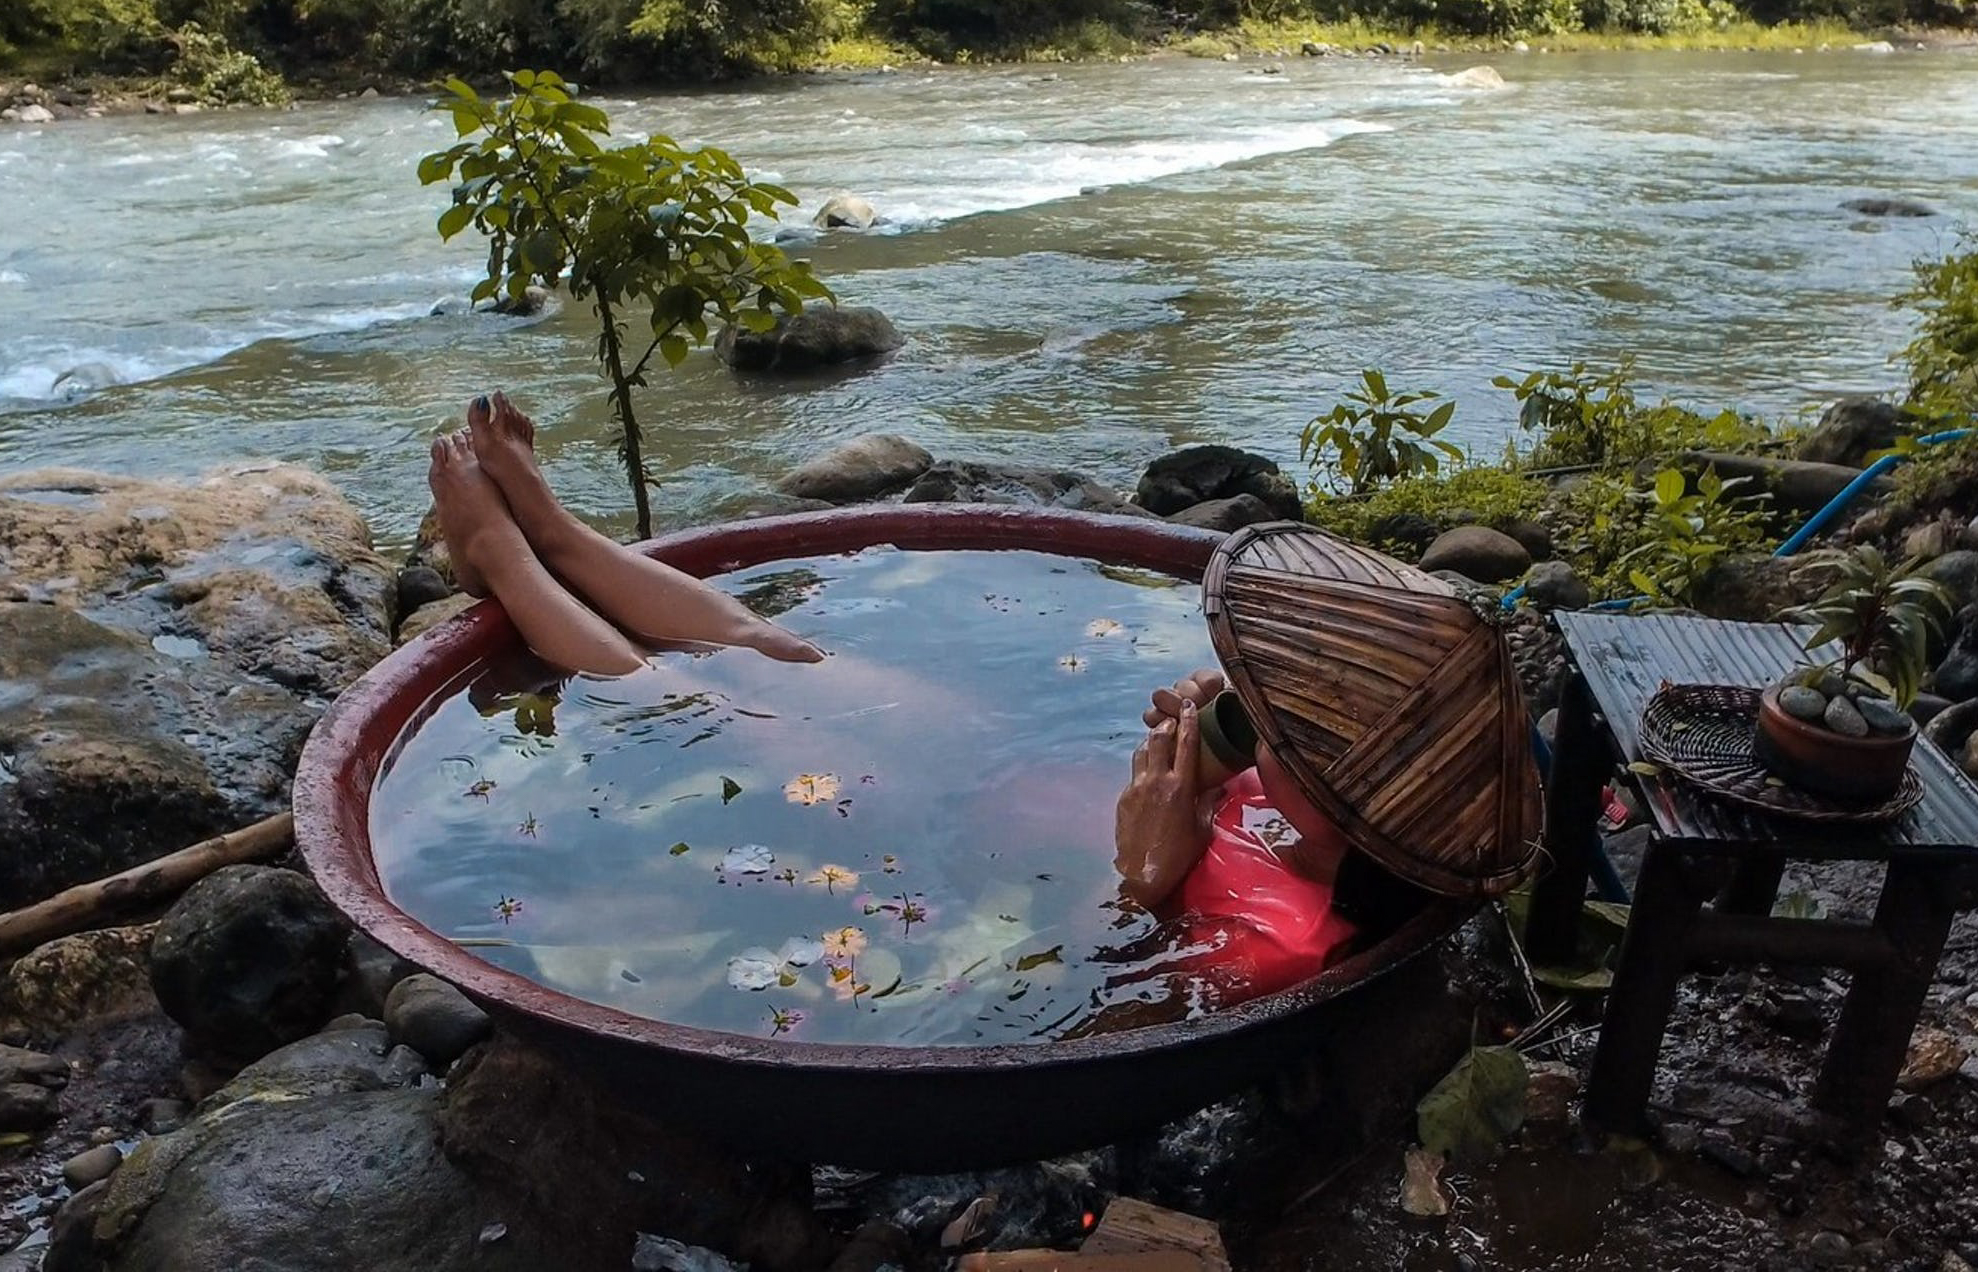 Aklan Malay Eco Tour to Nabaoy River & Pangihan Cave With Lunch